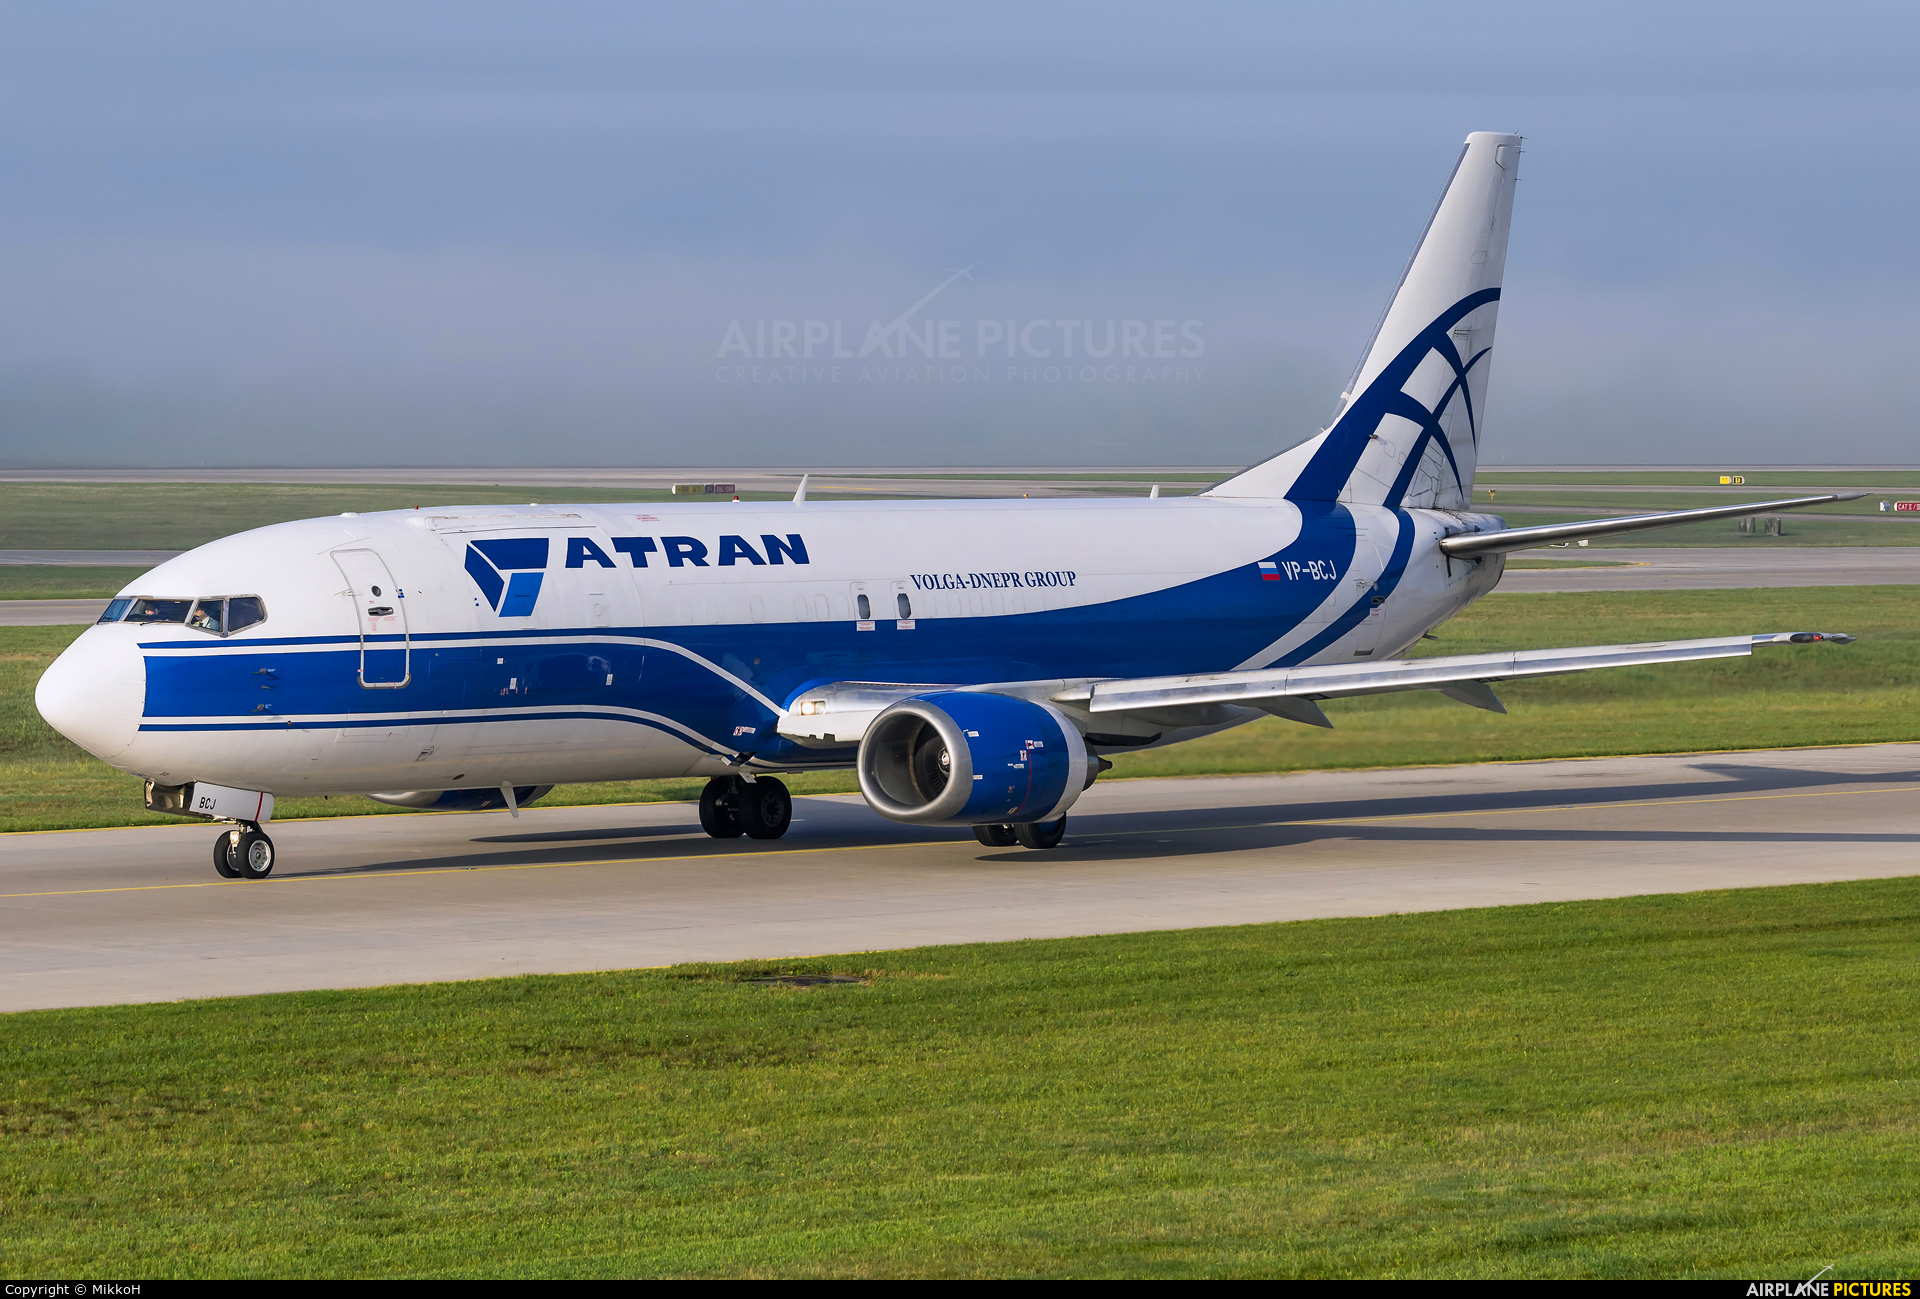 Atran VP-BCJ aircraft at Munich